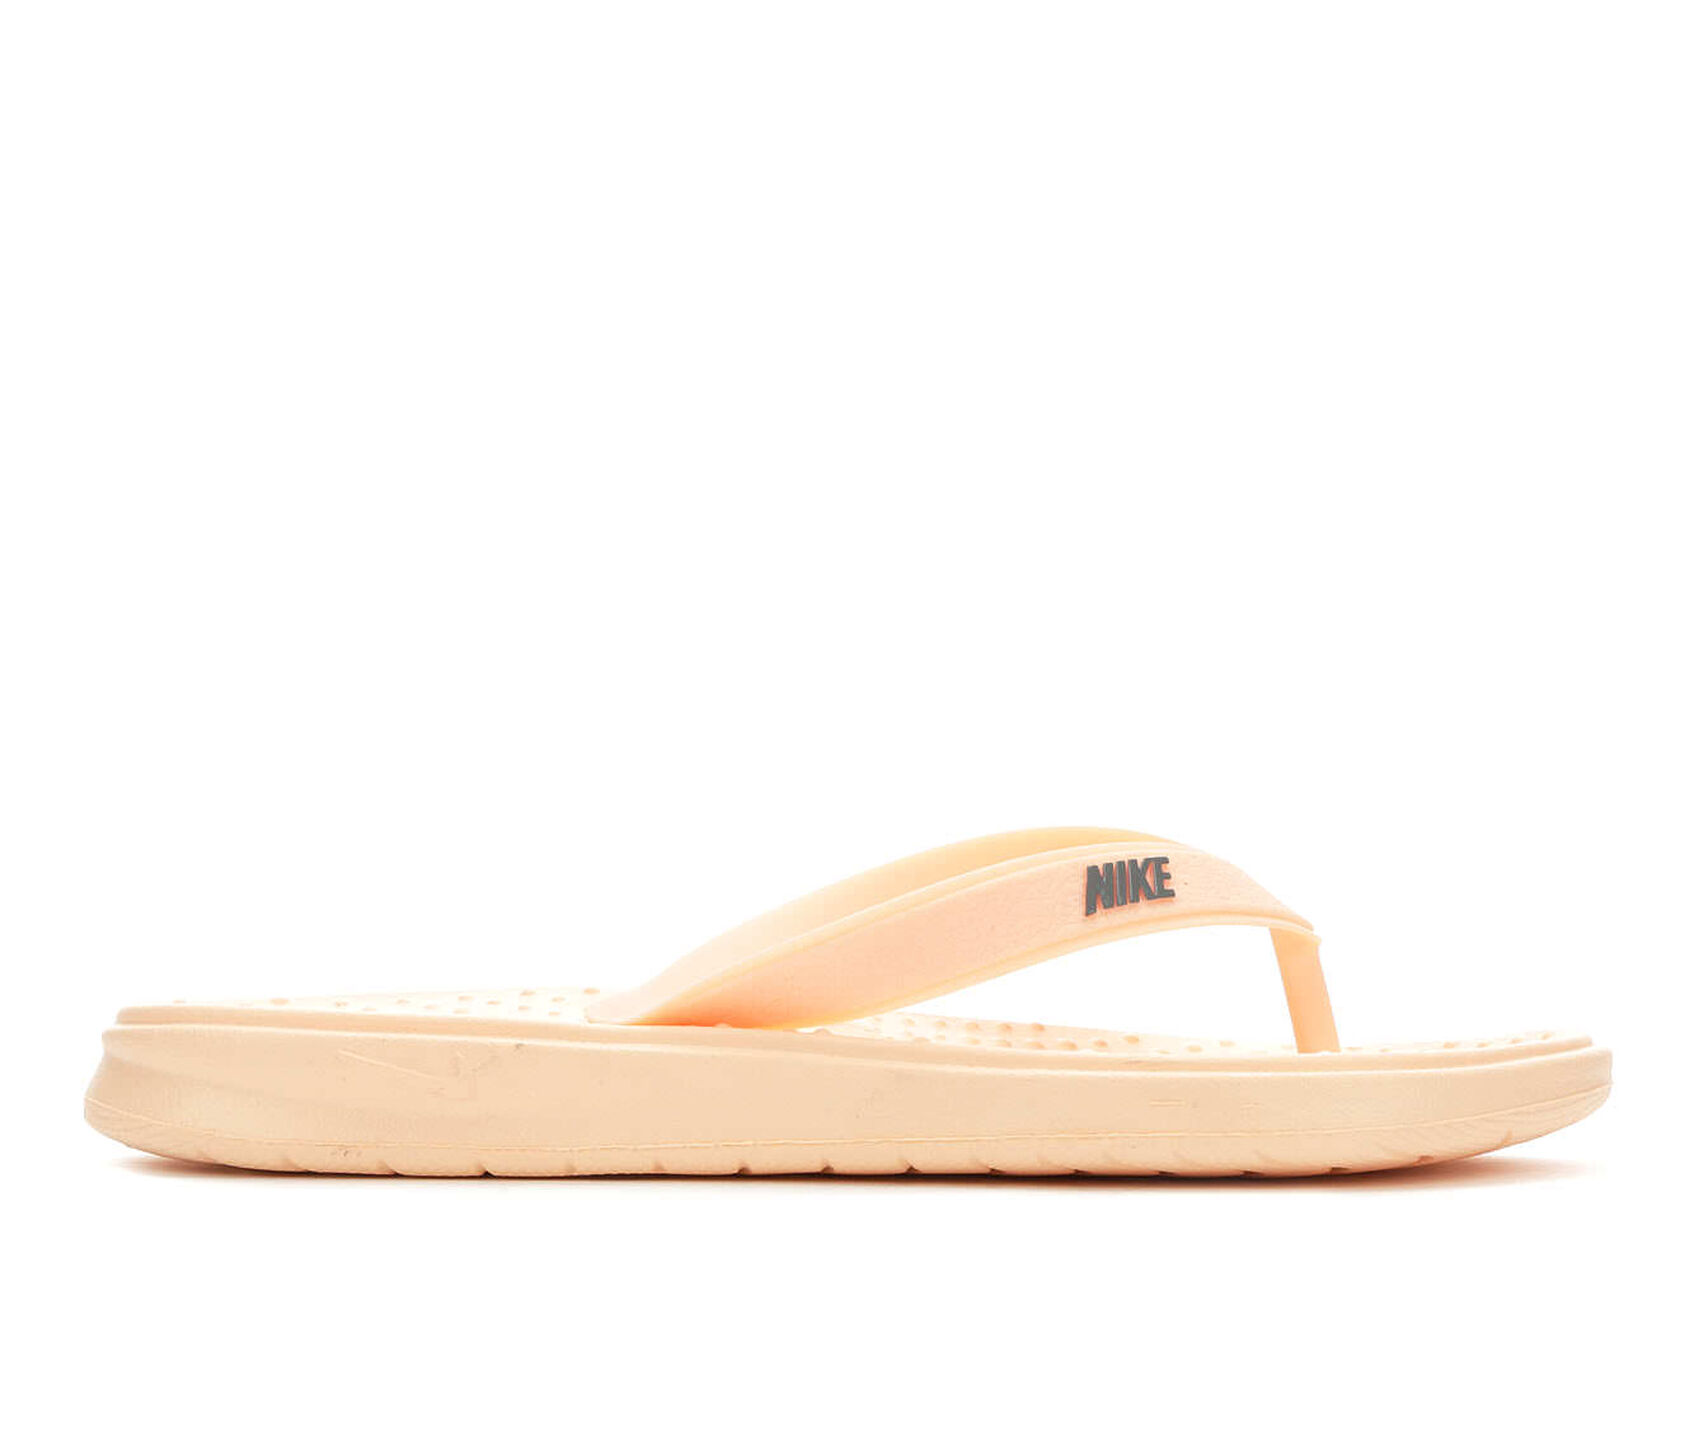 748a155842b4b5 ... Nike Solay Flip-Flop Sport Sandals. Previous